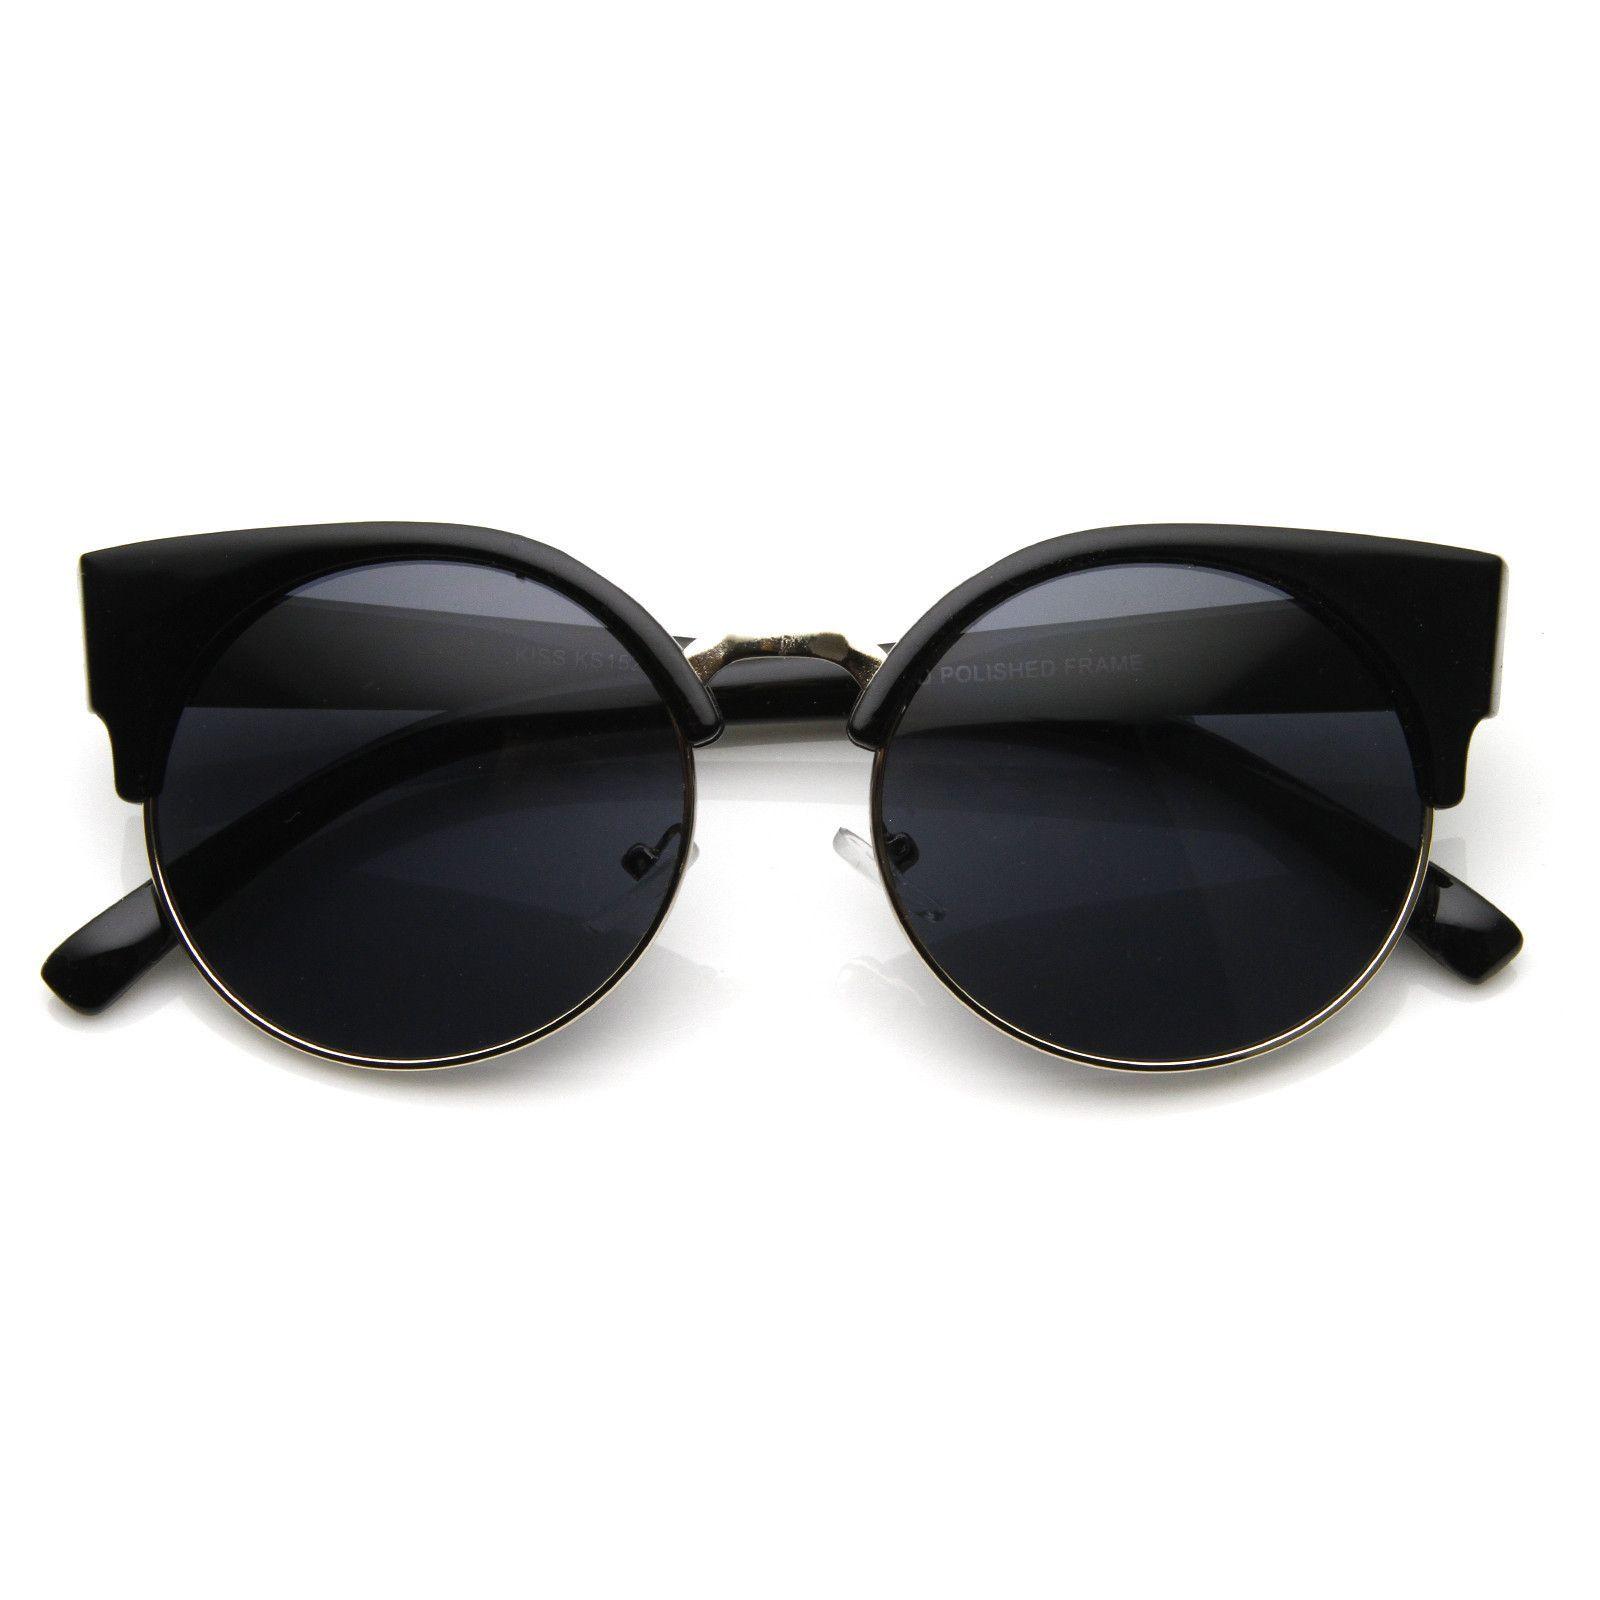 Ray Ban Black Cat Eye Sunglasses « Heritage Malta